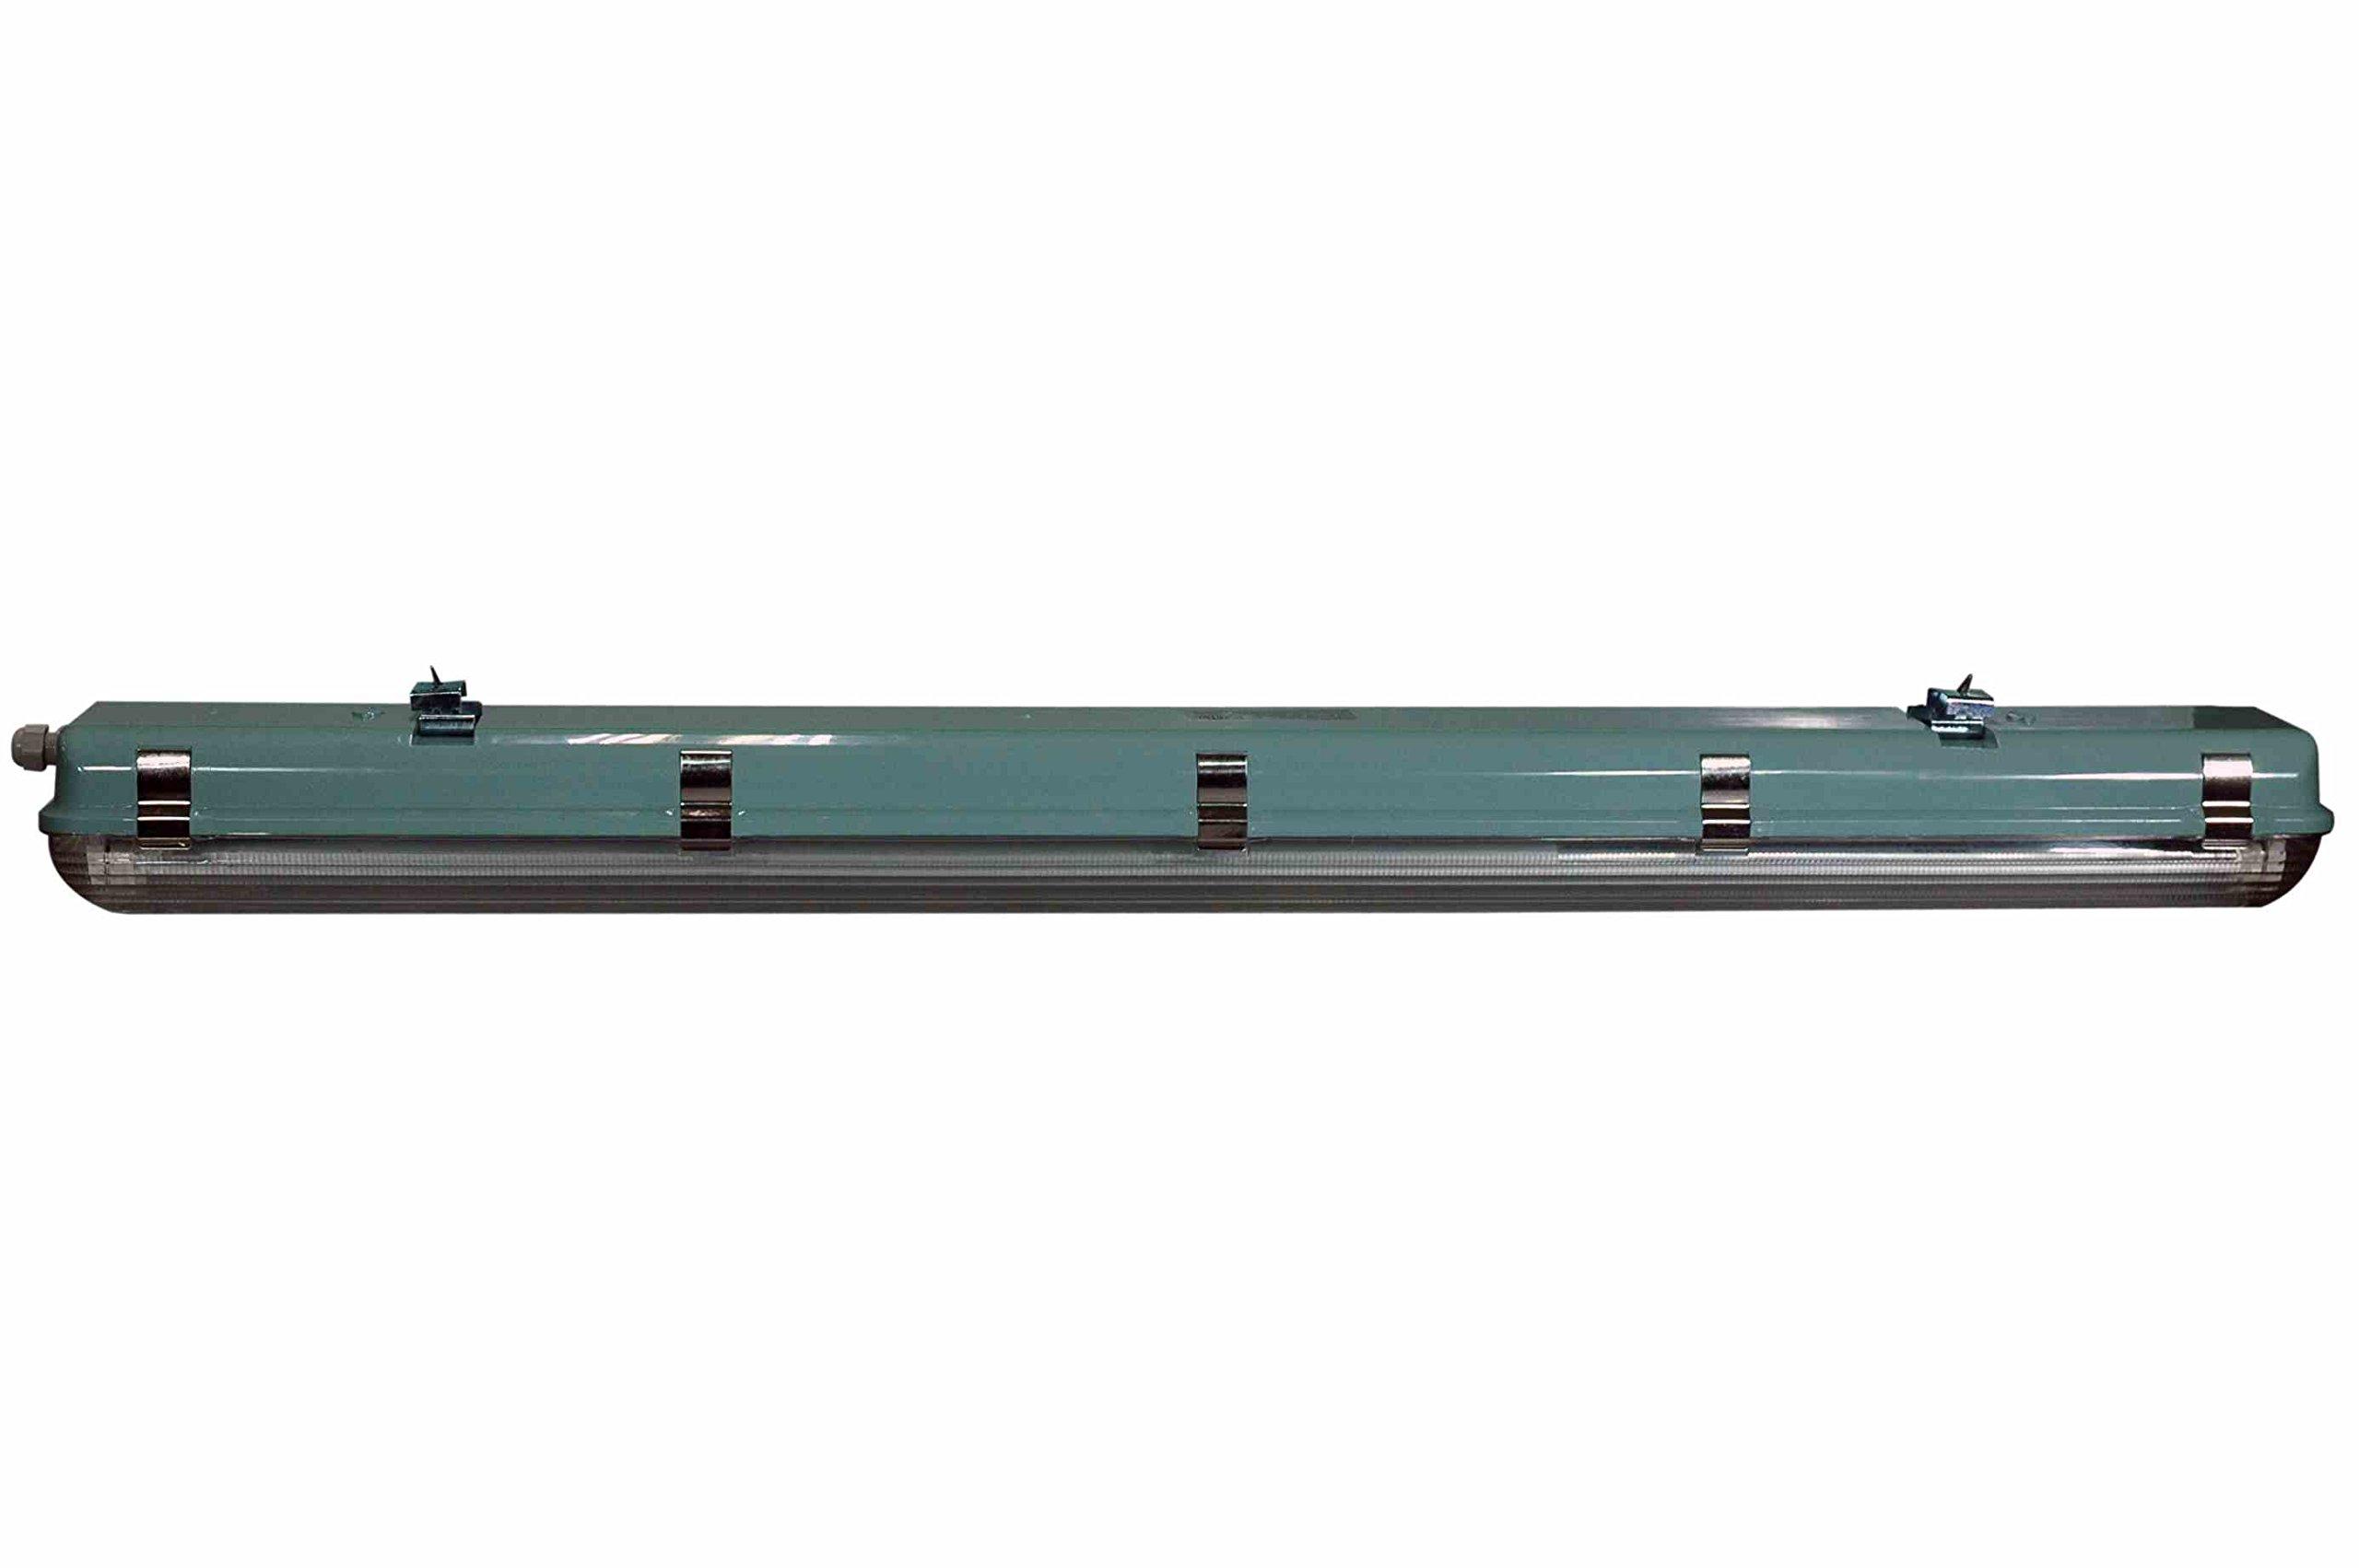 56 Watt Vapor Proof LED 4 Foot Light for Outdoor Applications - 7000 Lumens - 6' Cord - IP67 by Larson Electronics (Image #3)